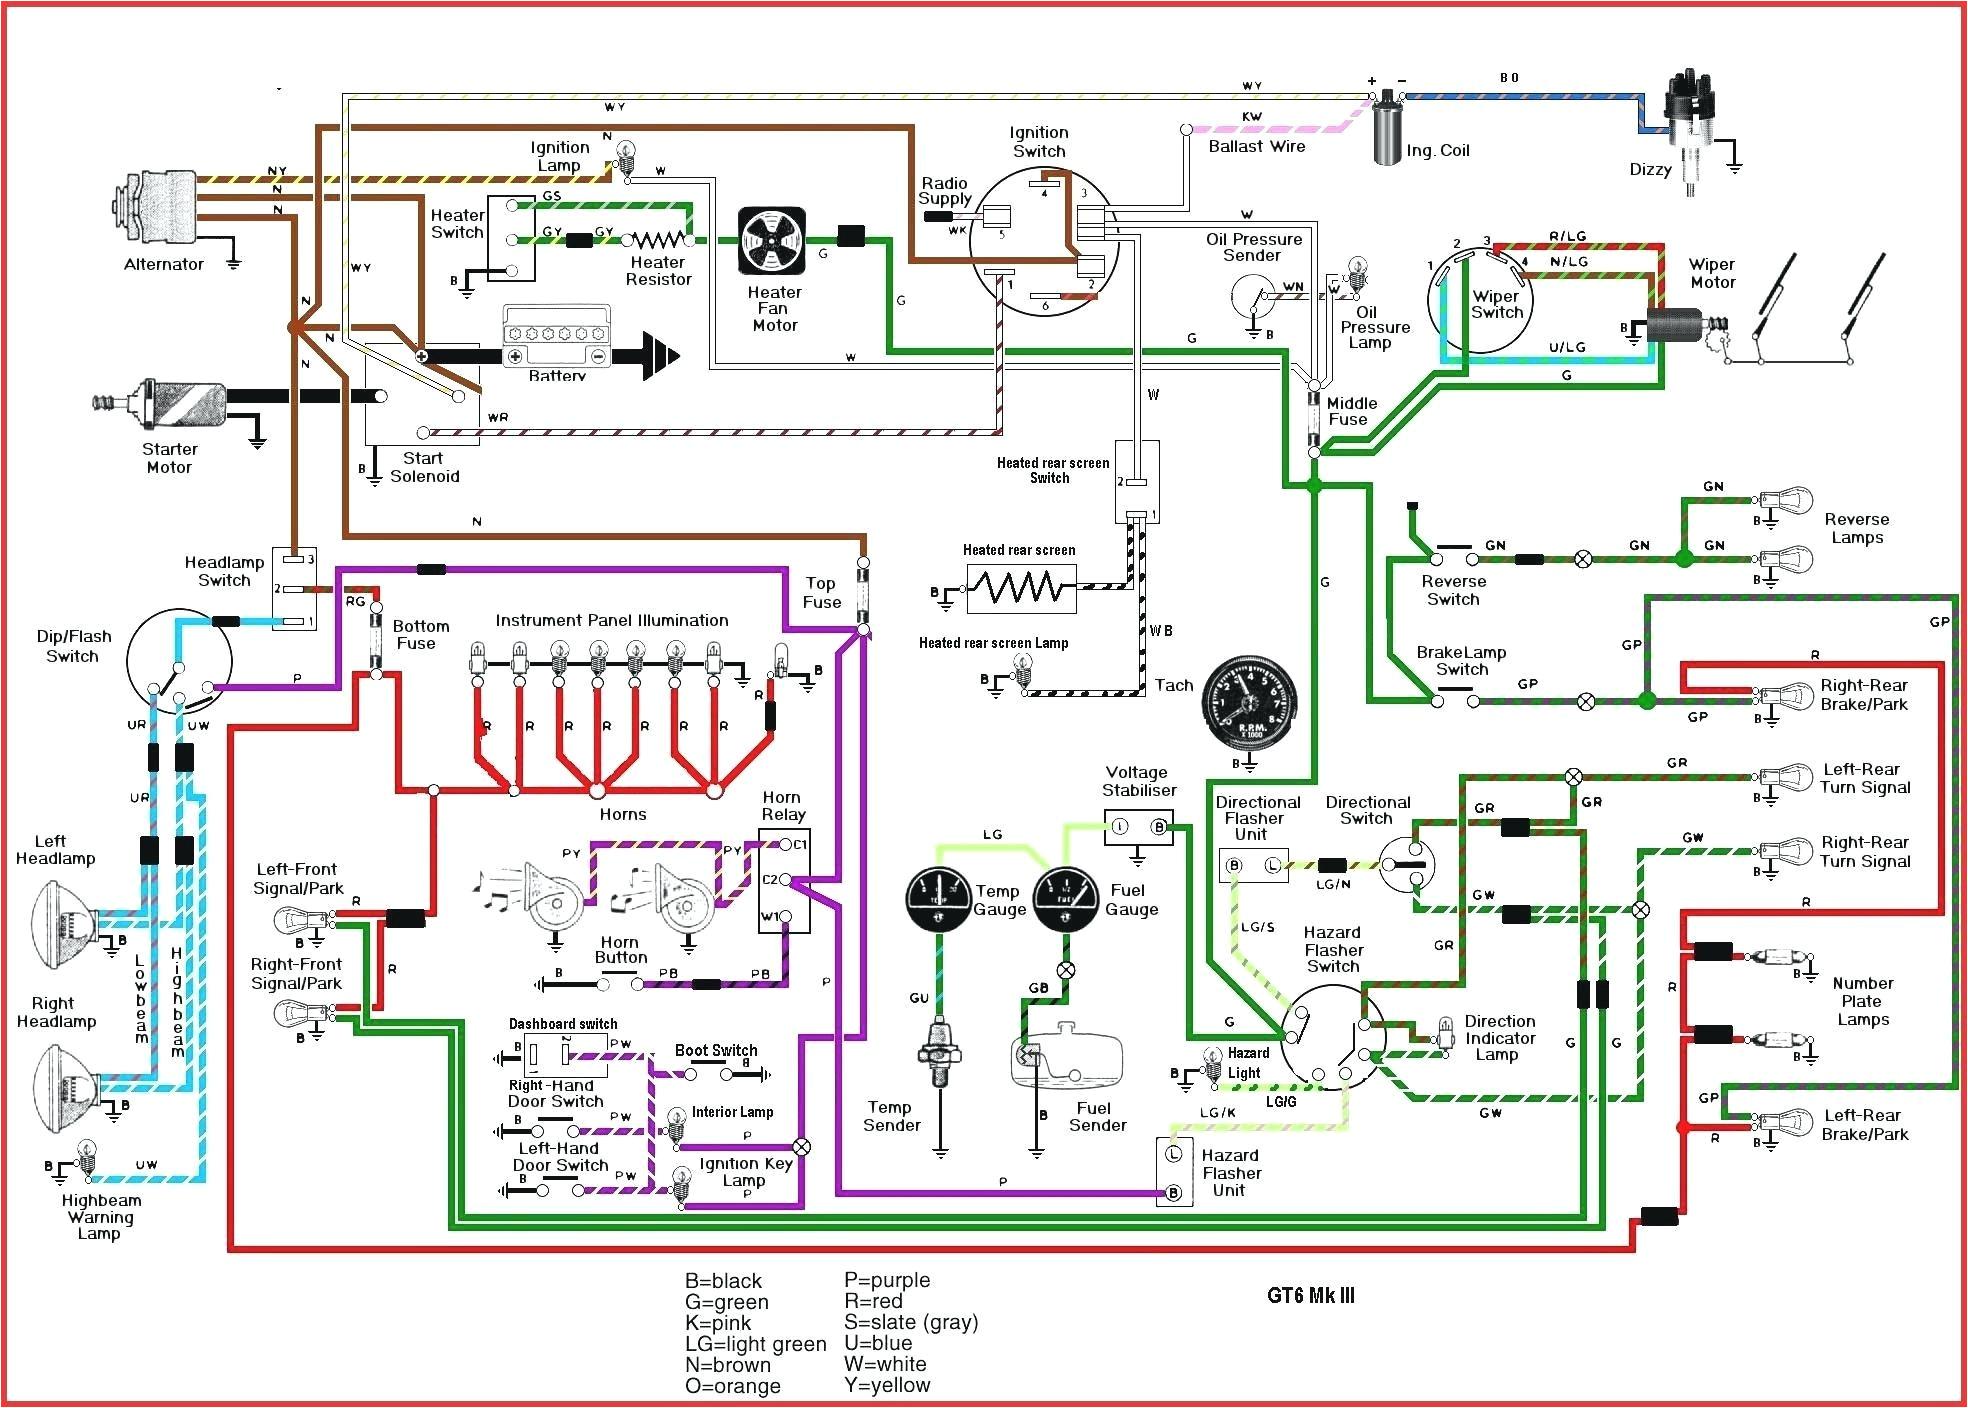 home wiring diagrams pdf wiring diagram toolbox electrical schematic diagram pdf electrical wiring diagrams pdf